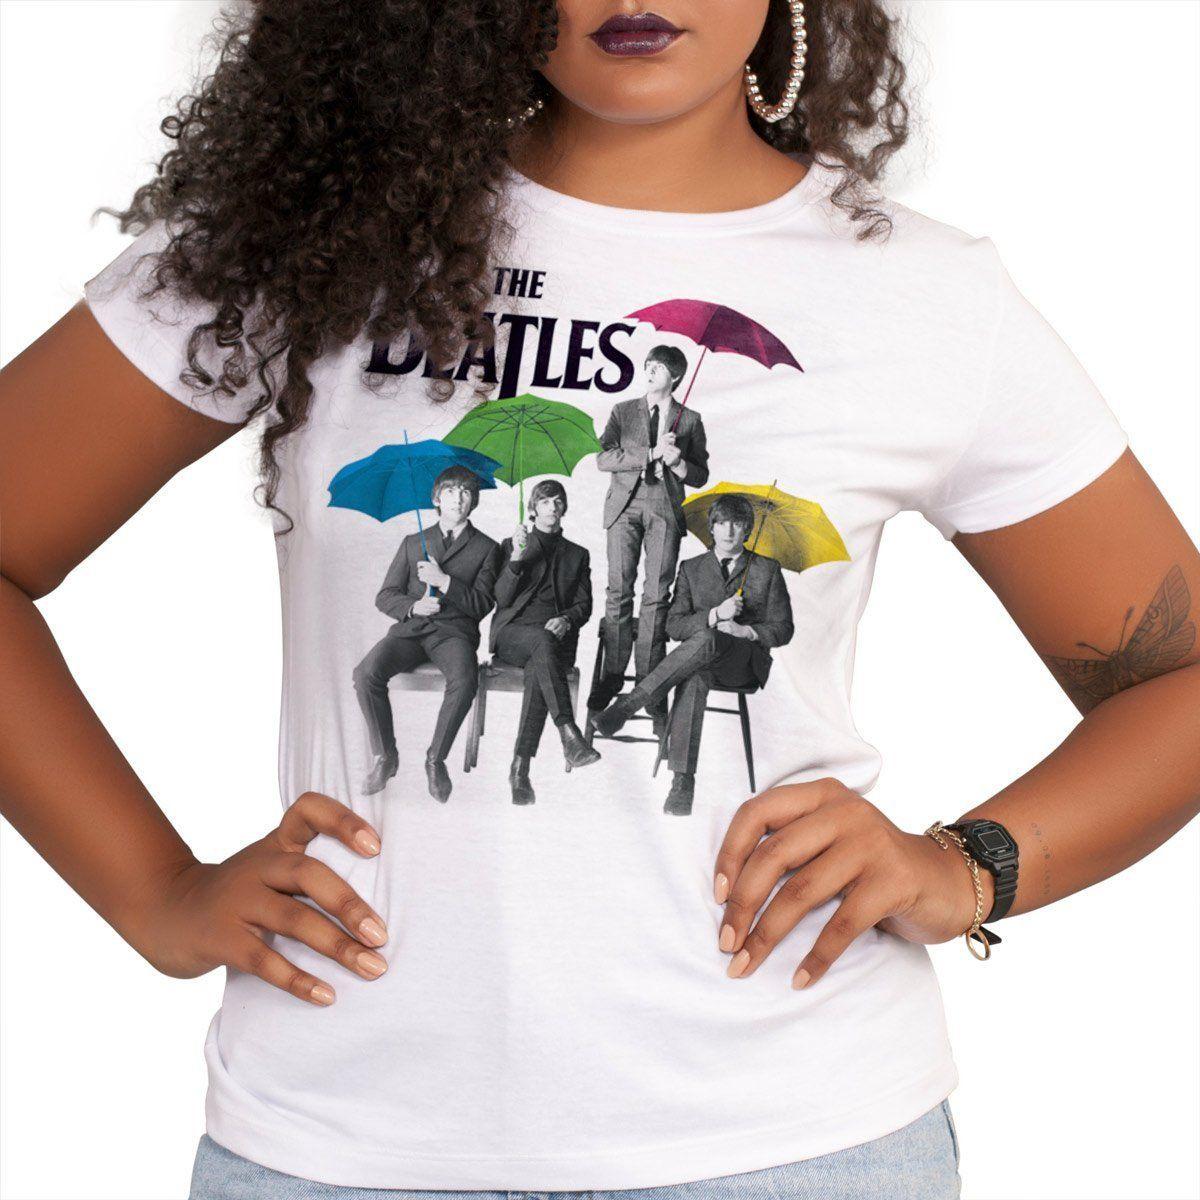 Camiseta Feminina The Beatles Umbrella Colors  - bandUP Store Marketplace